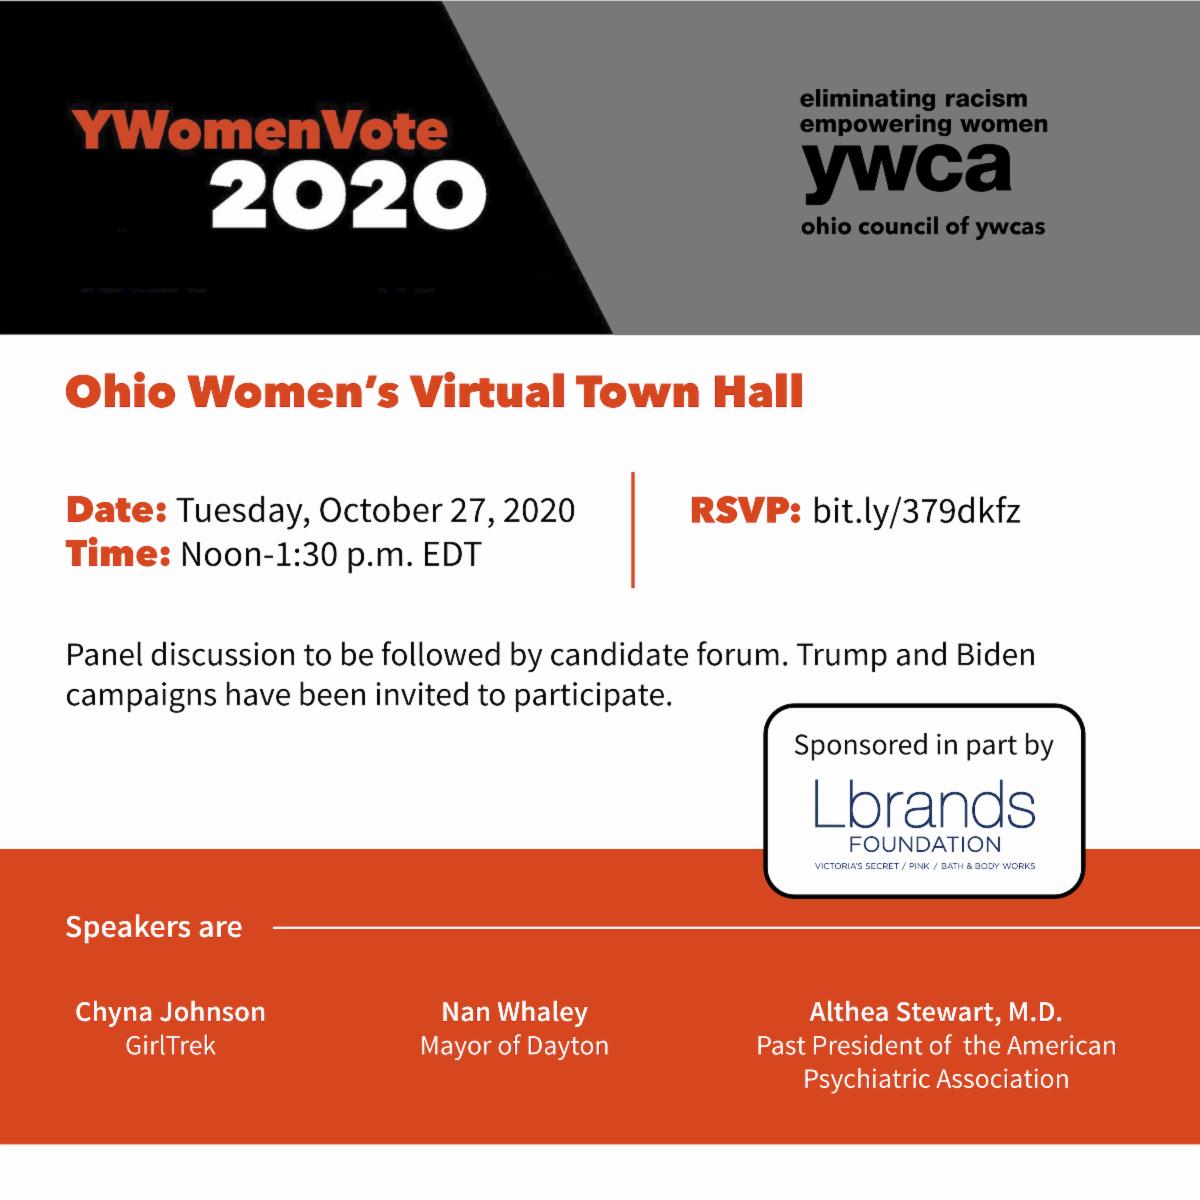 Ohio Womens Virtual Town Hall